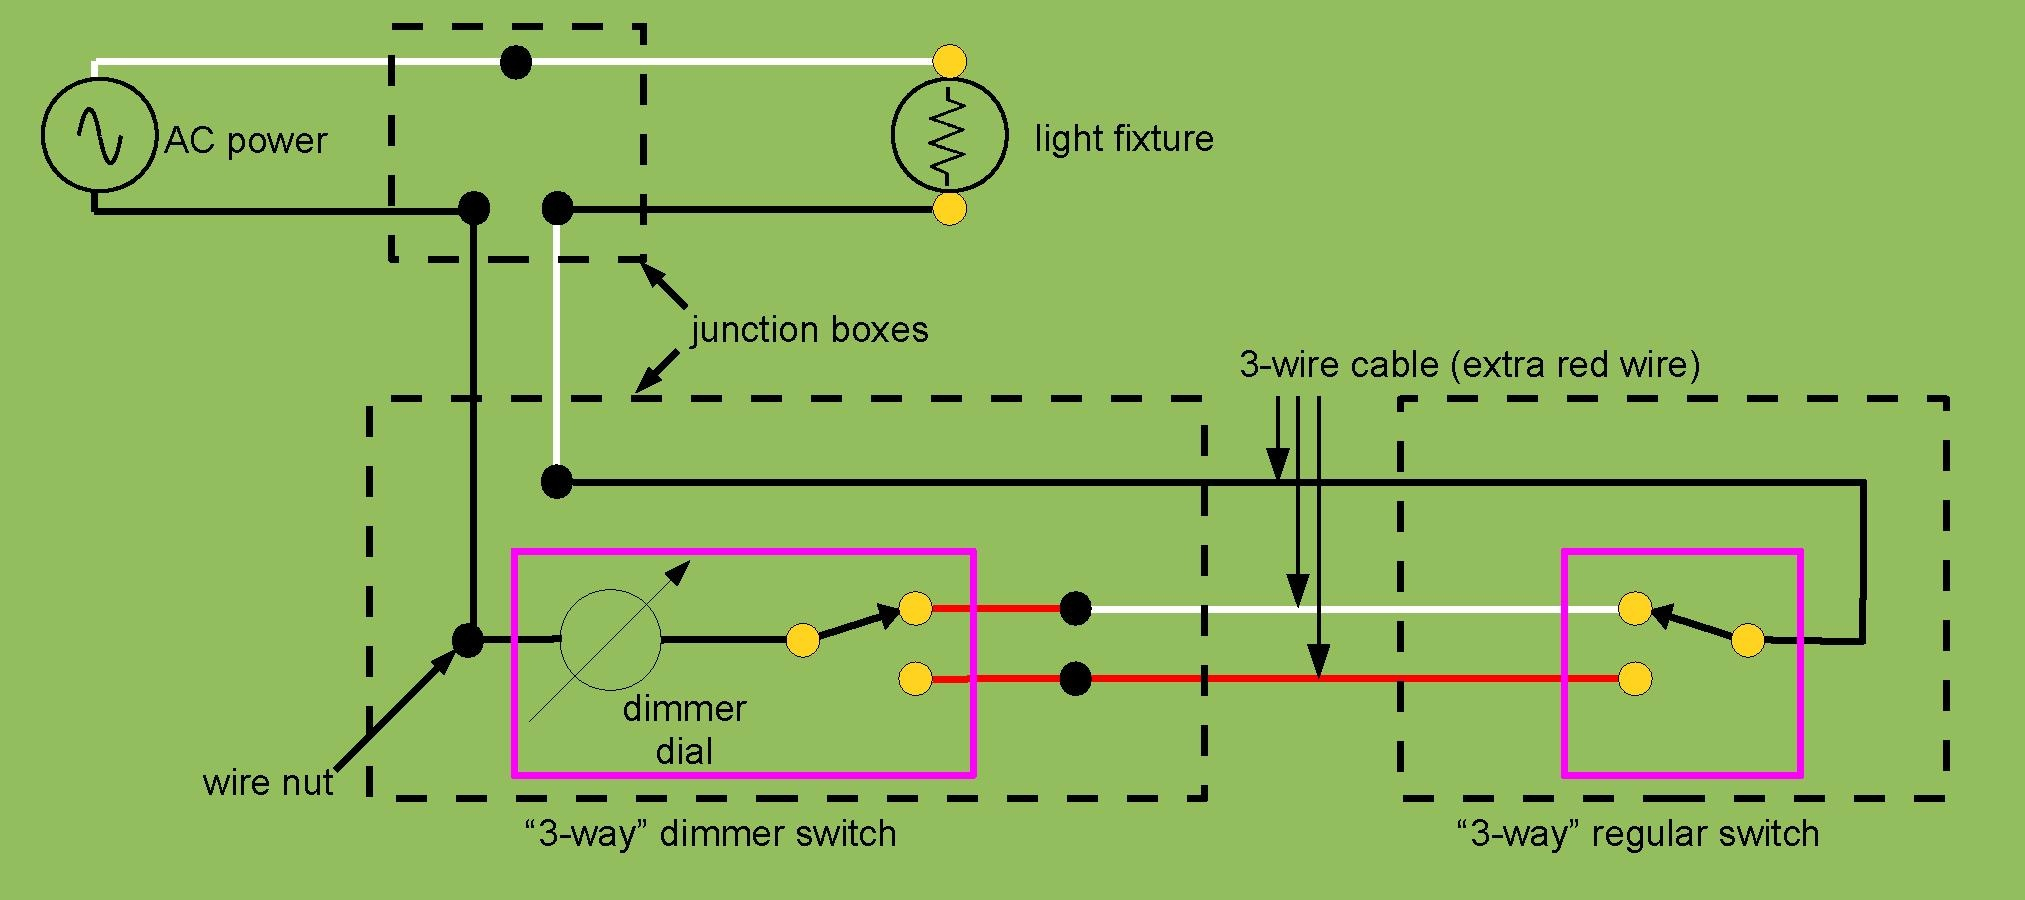 File:3-Way Dimmer Switch Wiring.pdf - Wikimedia Commons - 3 Way Switch Wiring Diagram Pdf